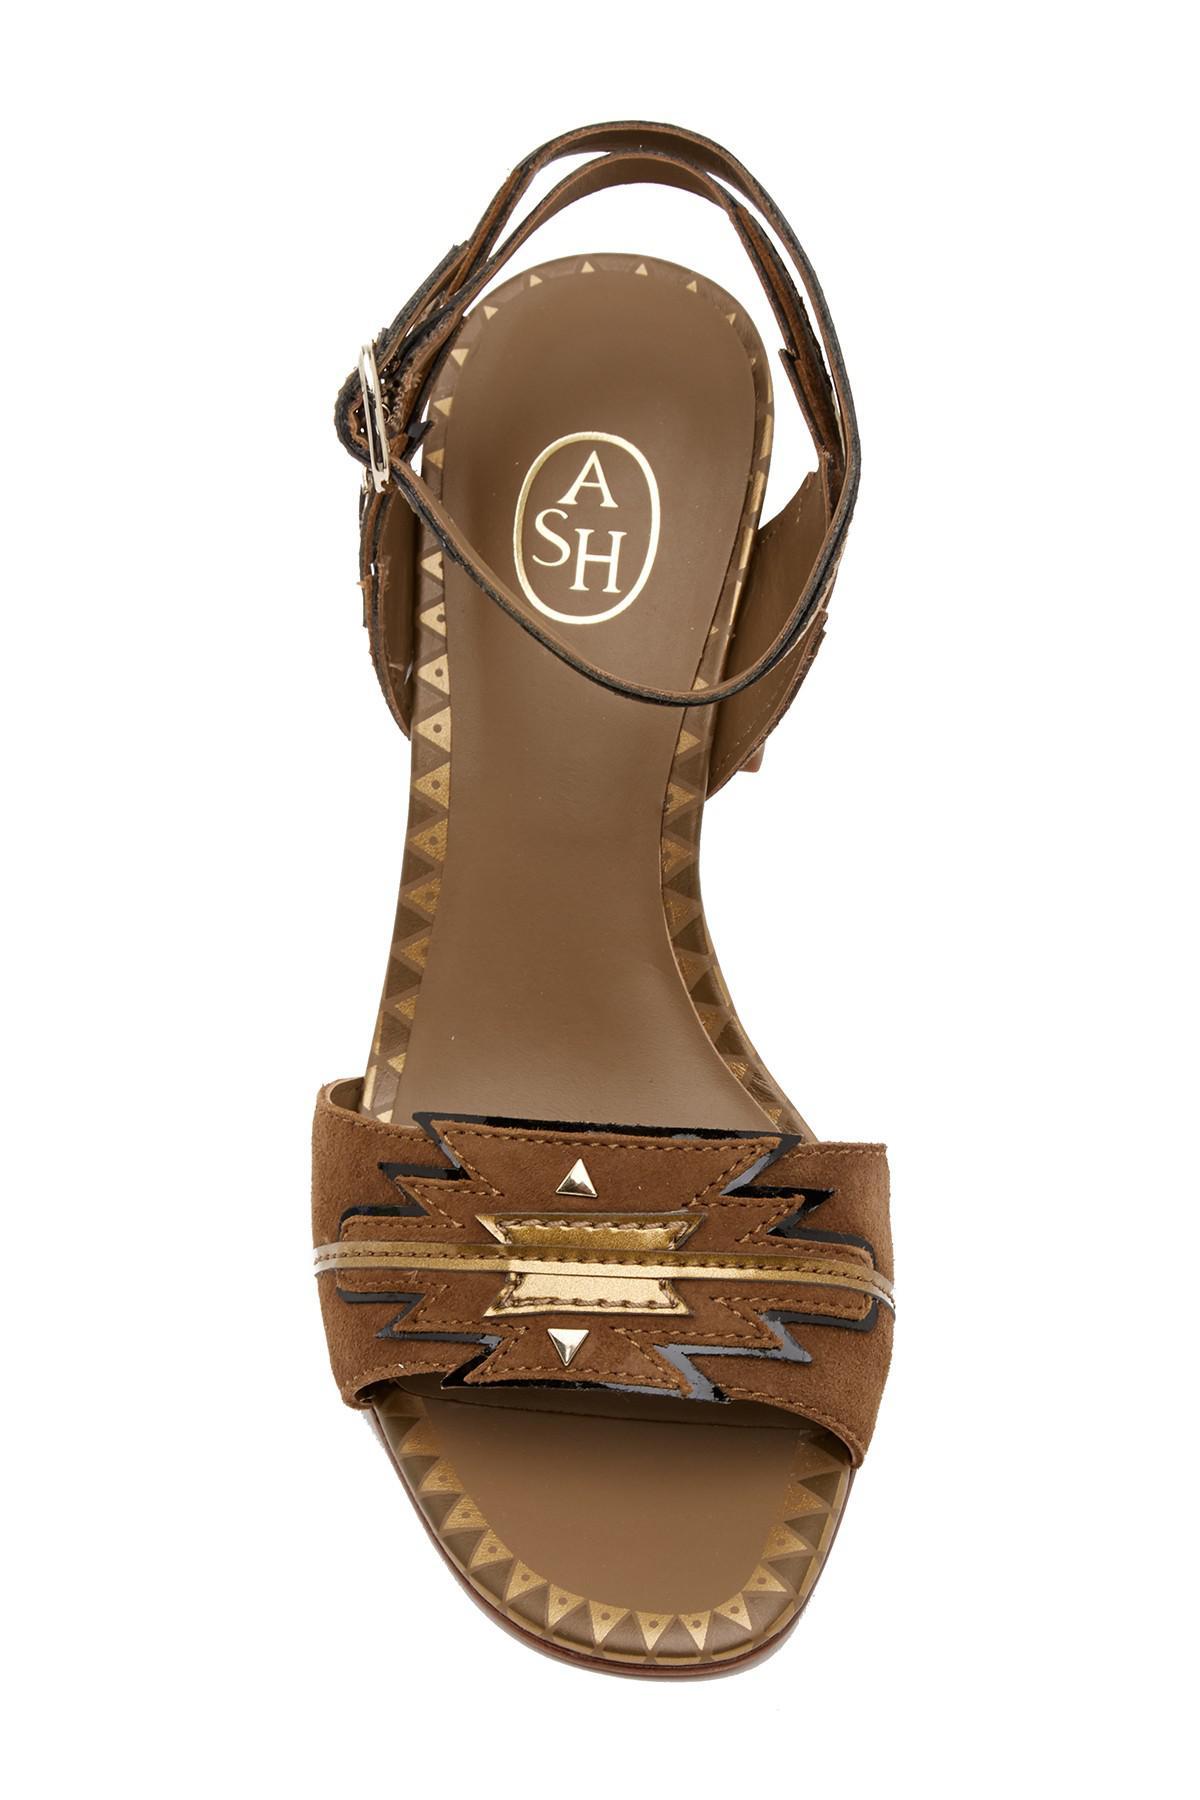 Ash Queen Geo Applique Sandal TMmby9lZRA